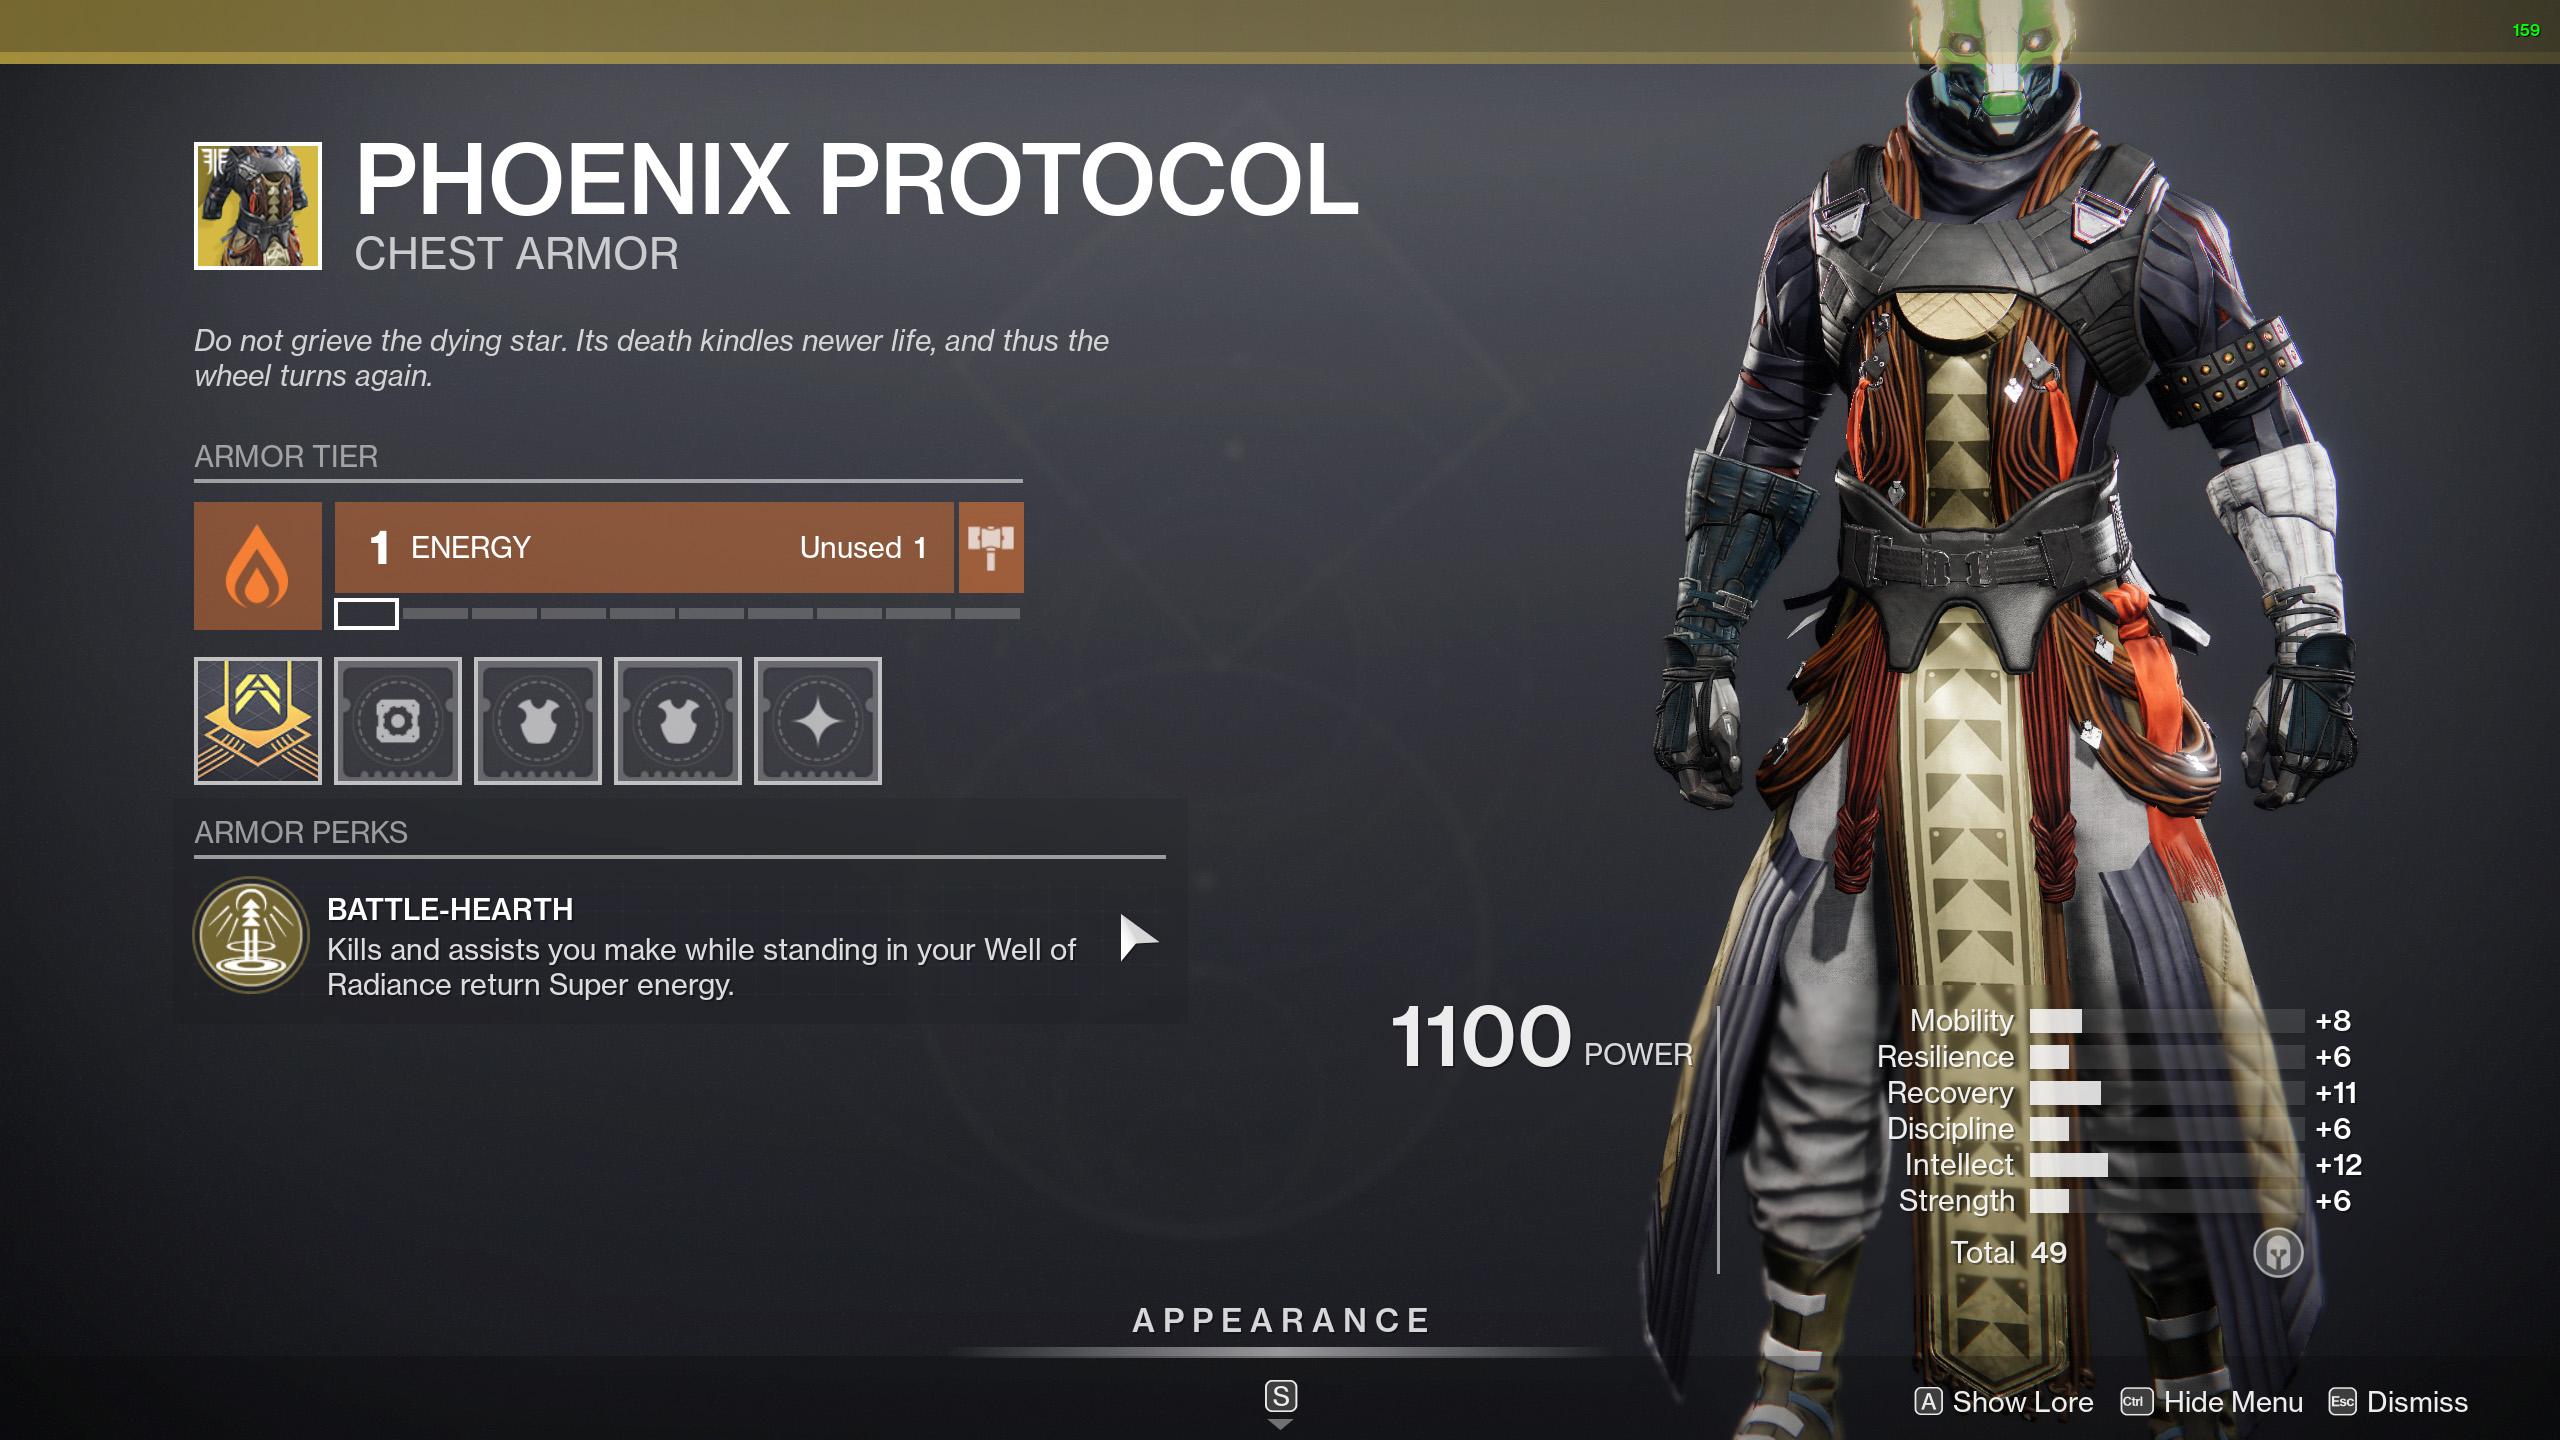 destiny 2 phoenix protocol